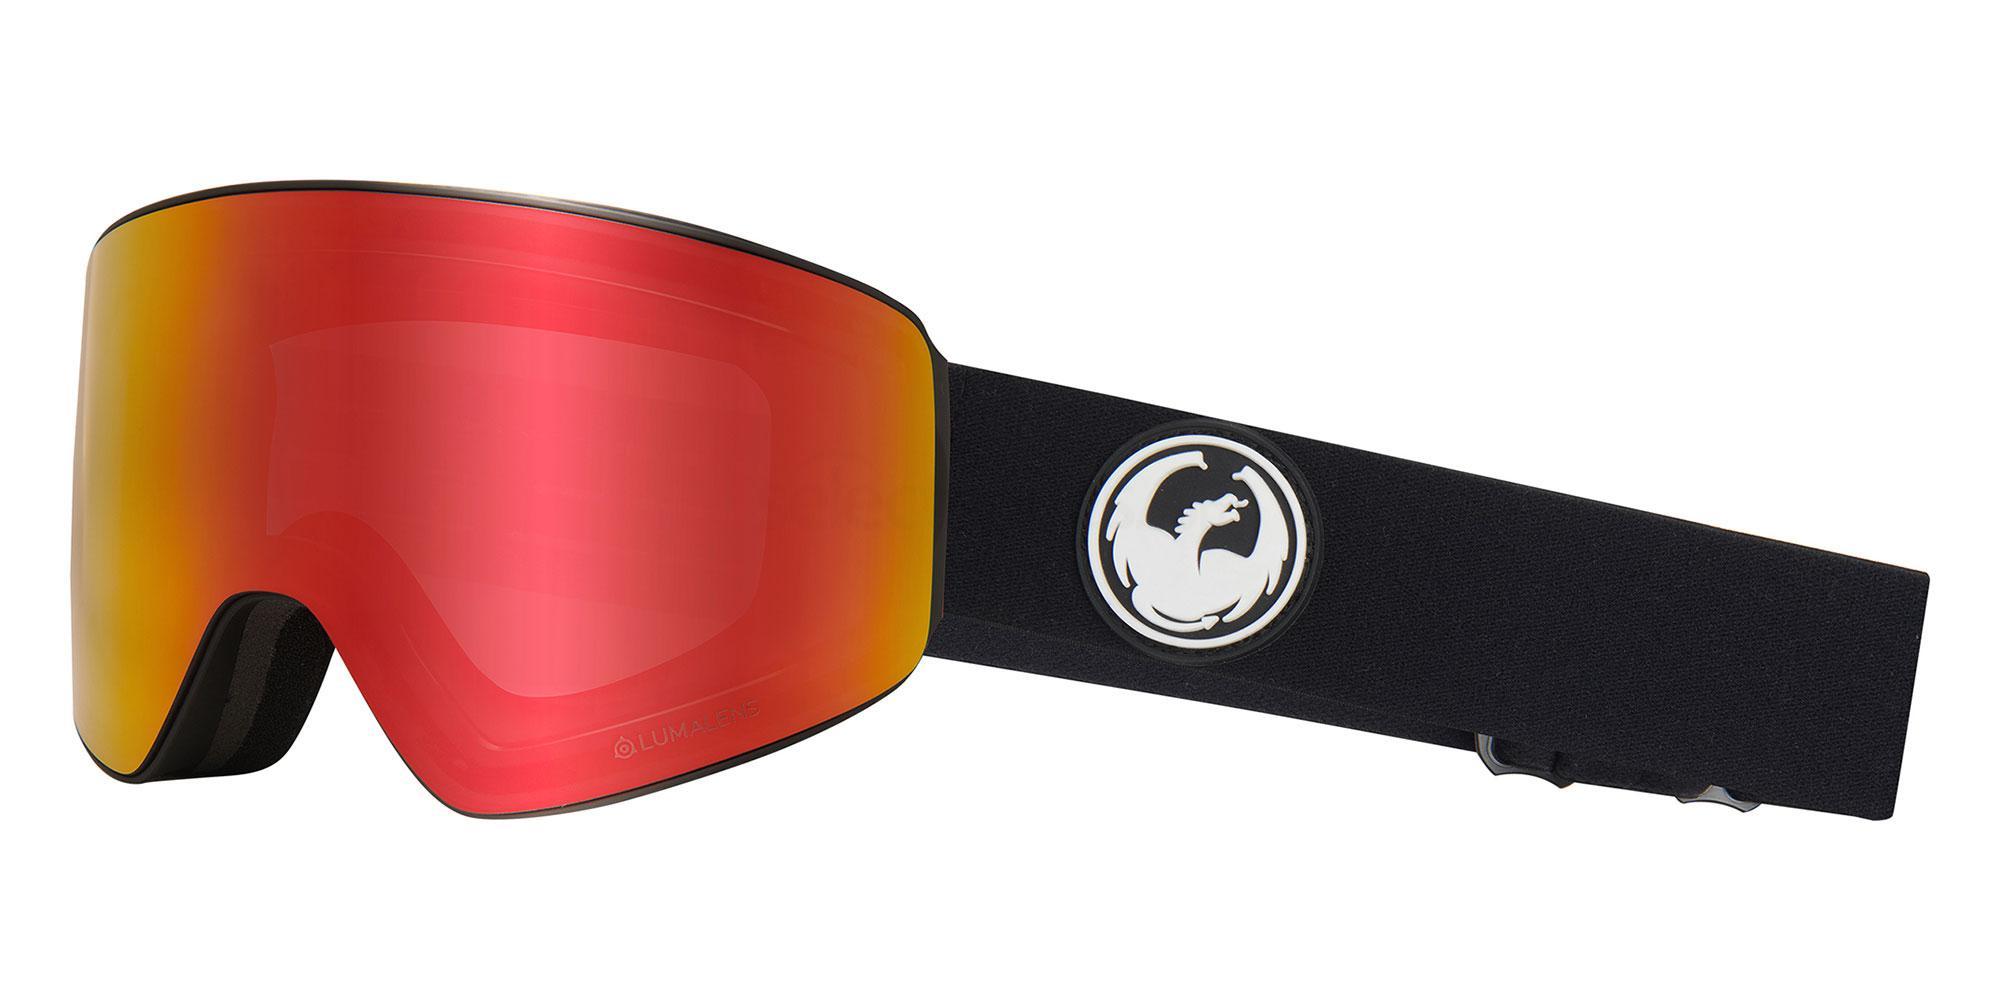 002 DR PXV BONUS Goggles, Dragon